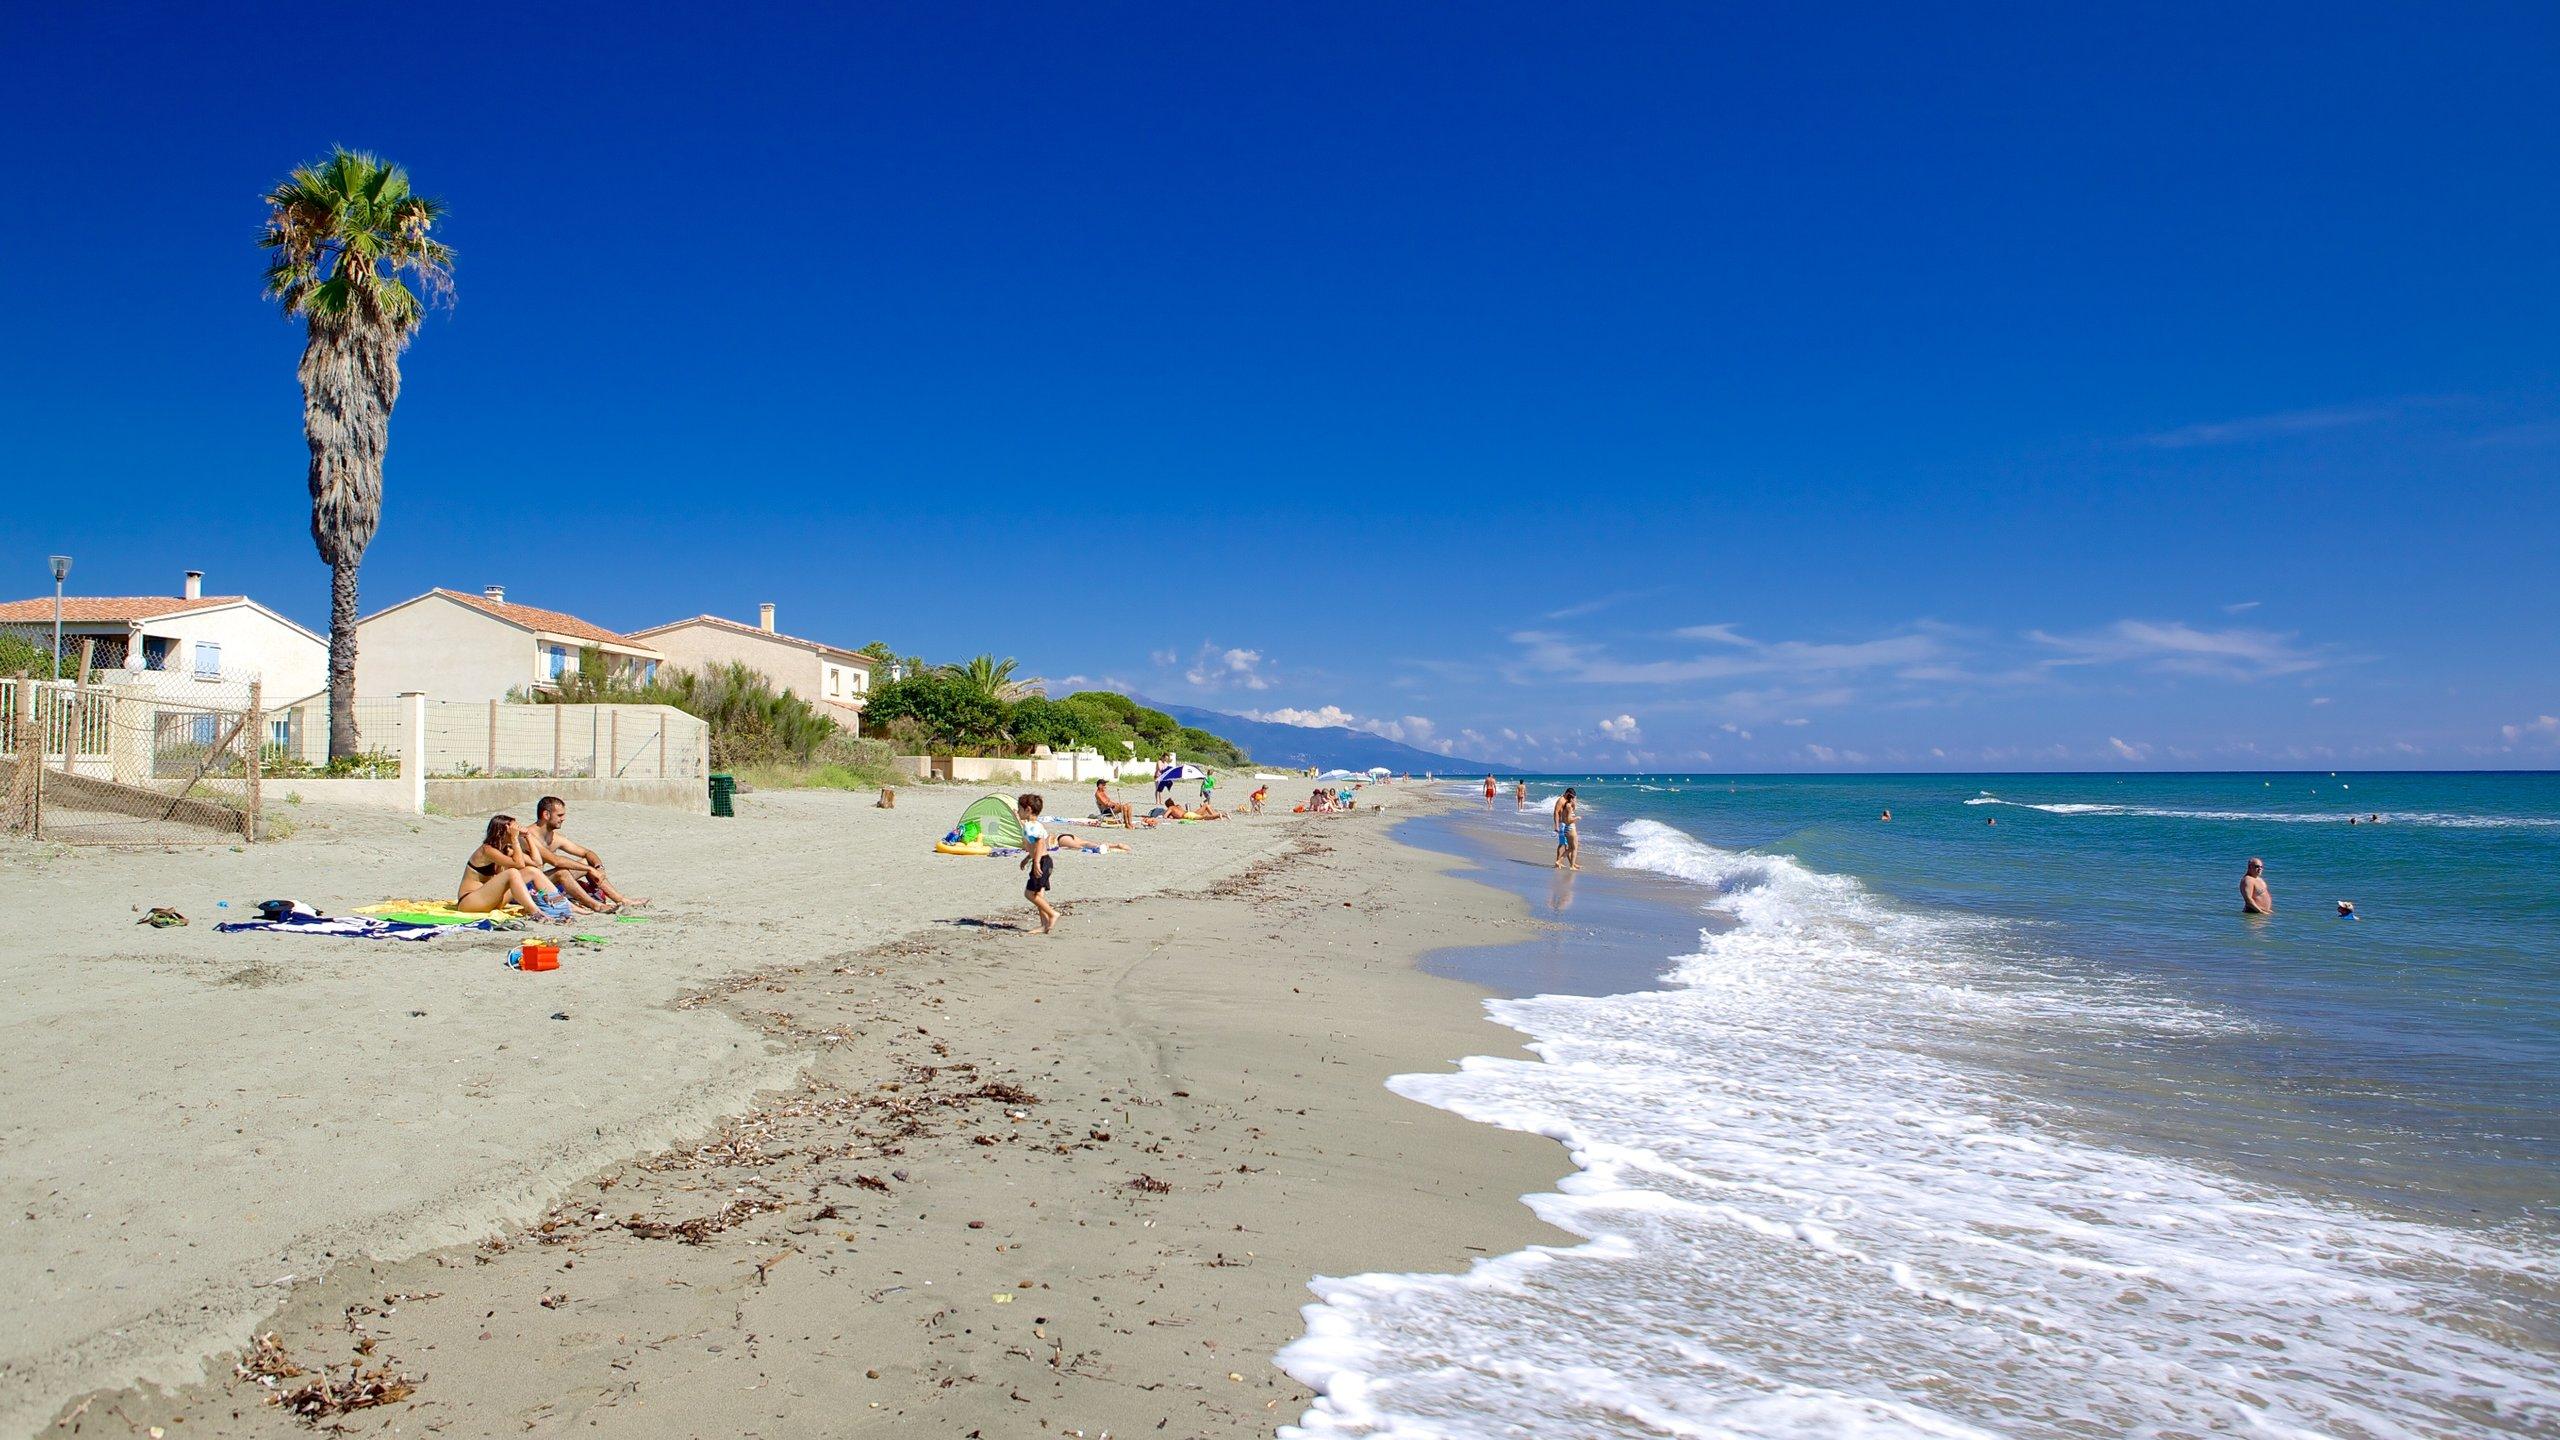 La Marana Beach, Haute-Corse, France